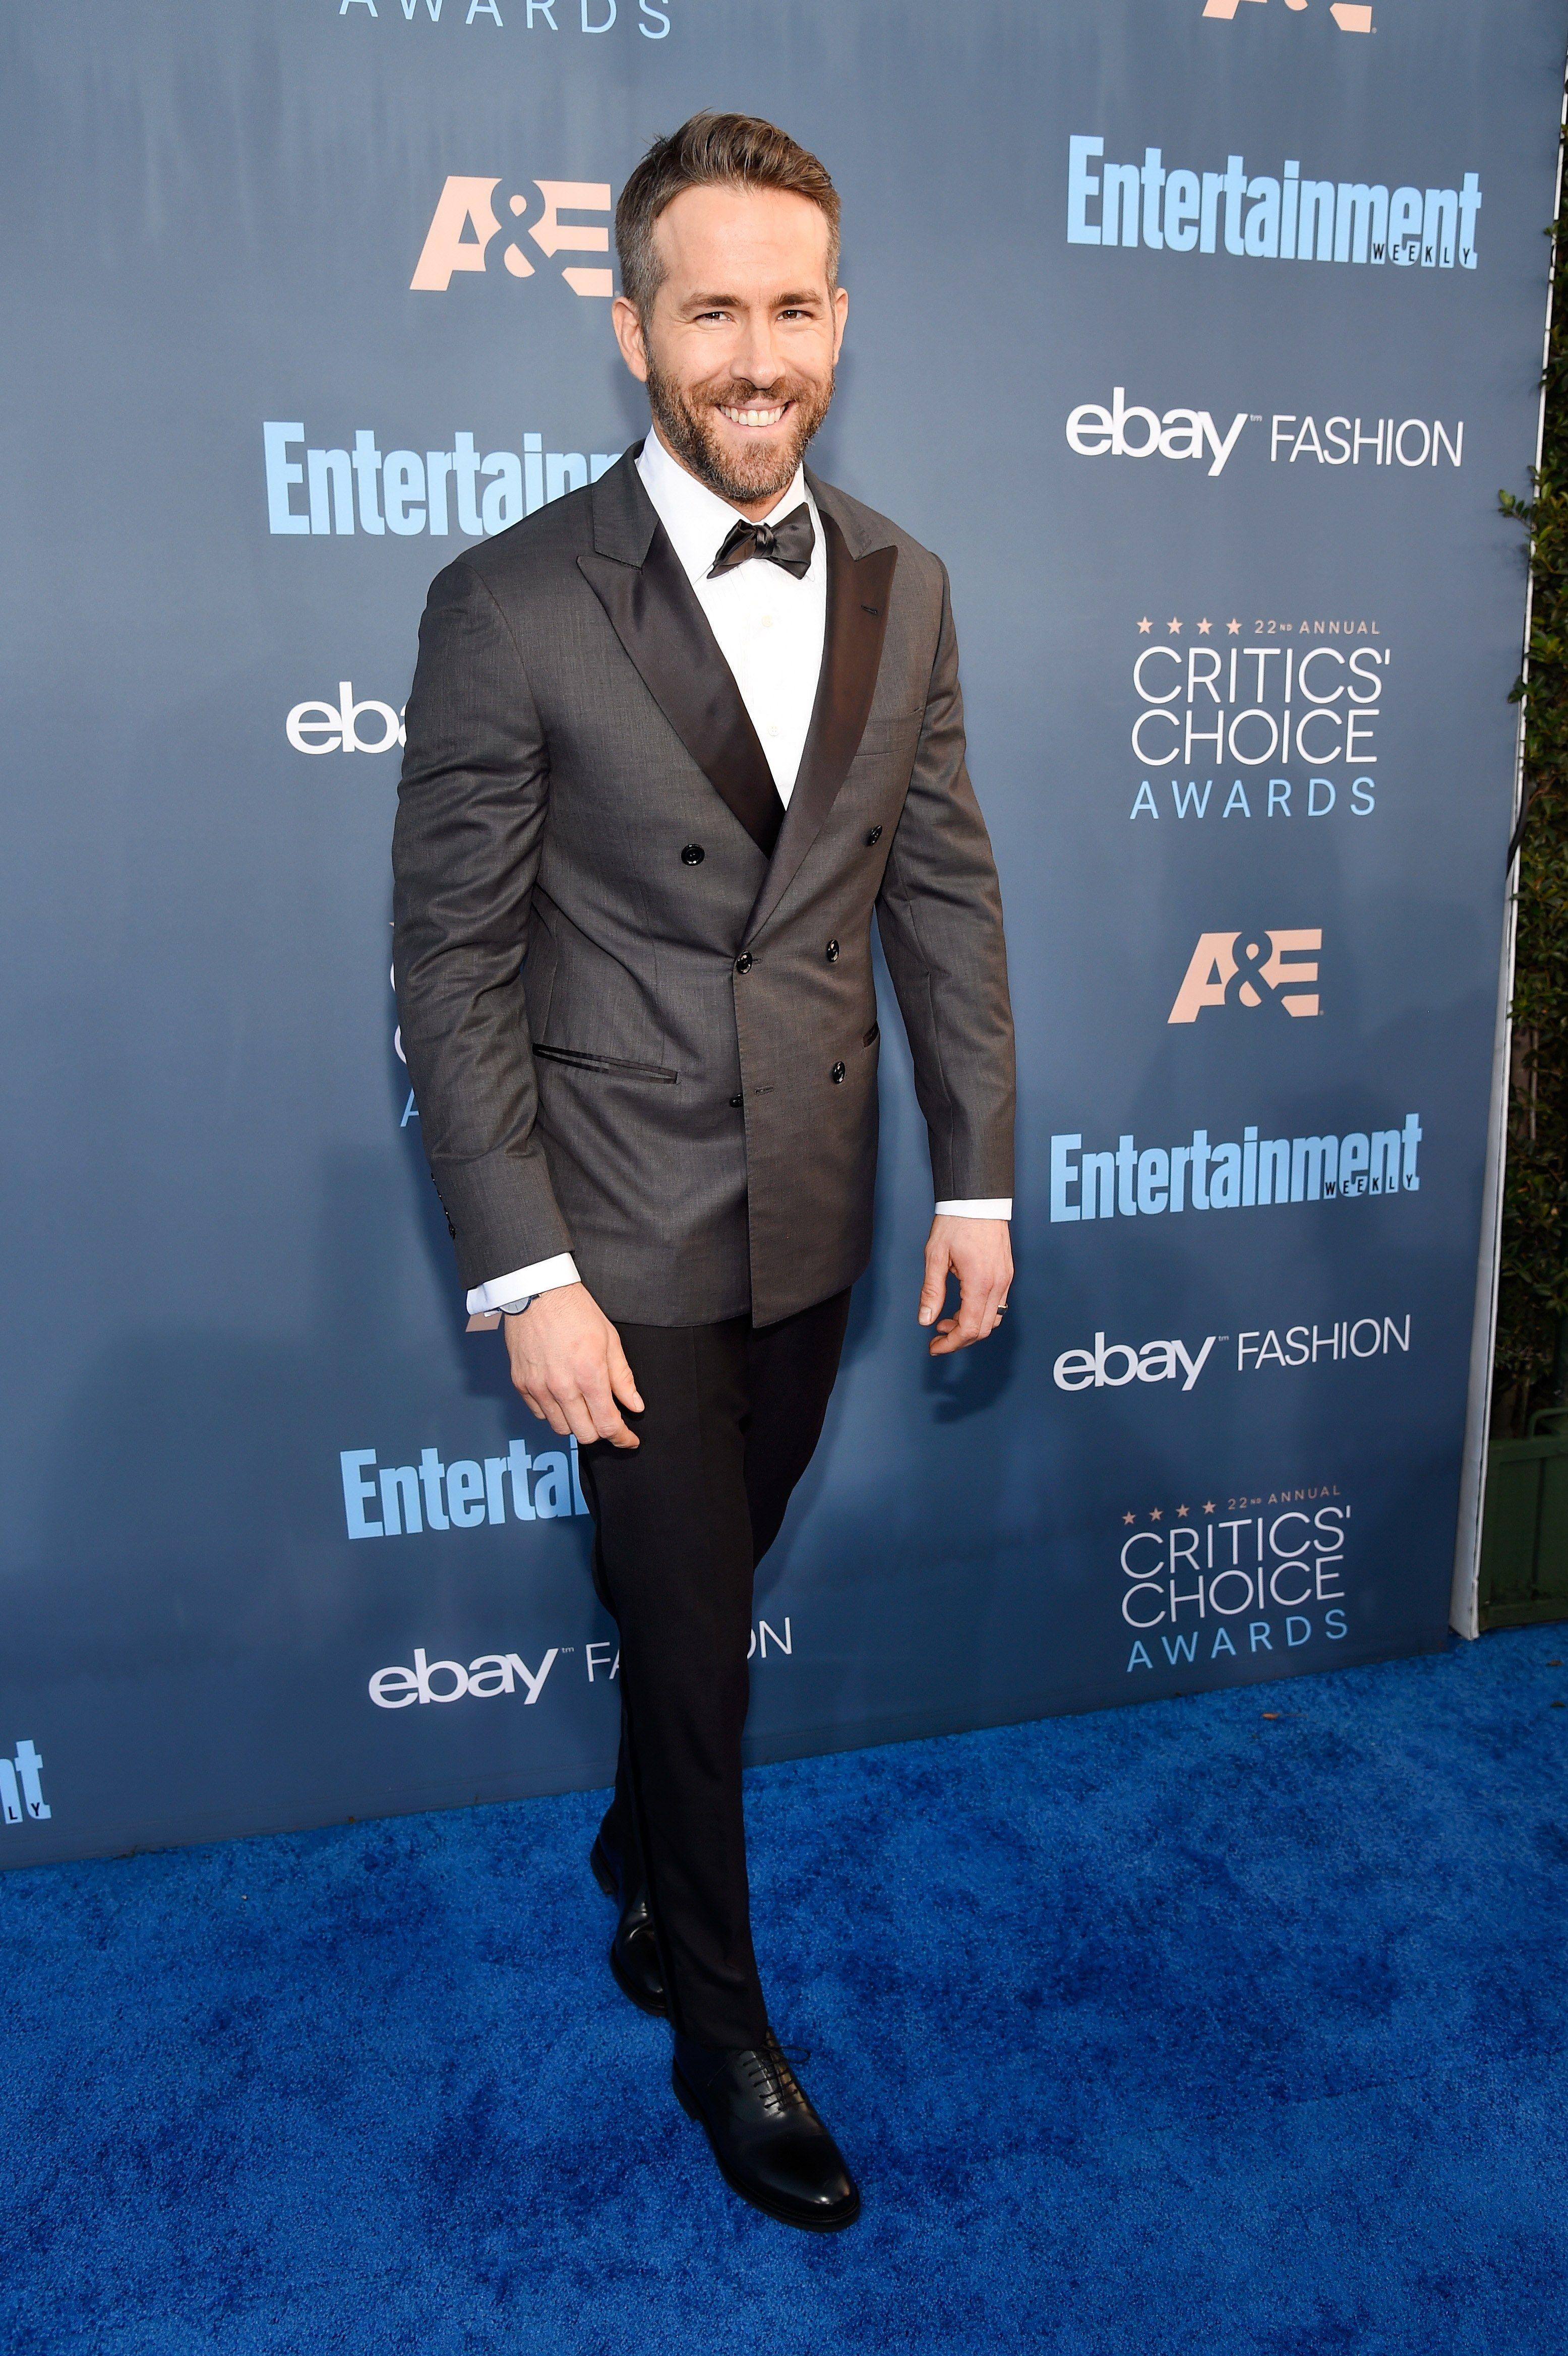 Ryan Reynolds At The 22nd Annual Critics Choice Awards On December 11 2016 In Santa Monica California